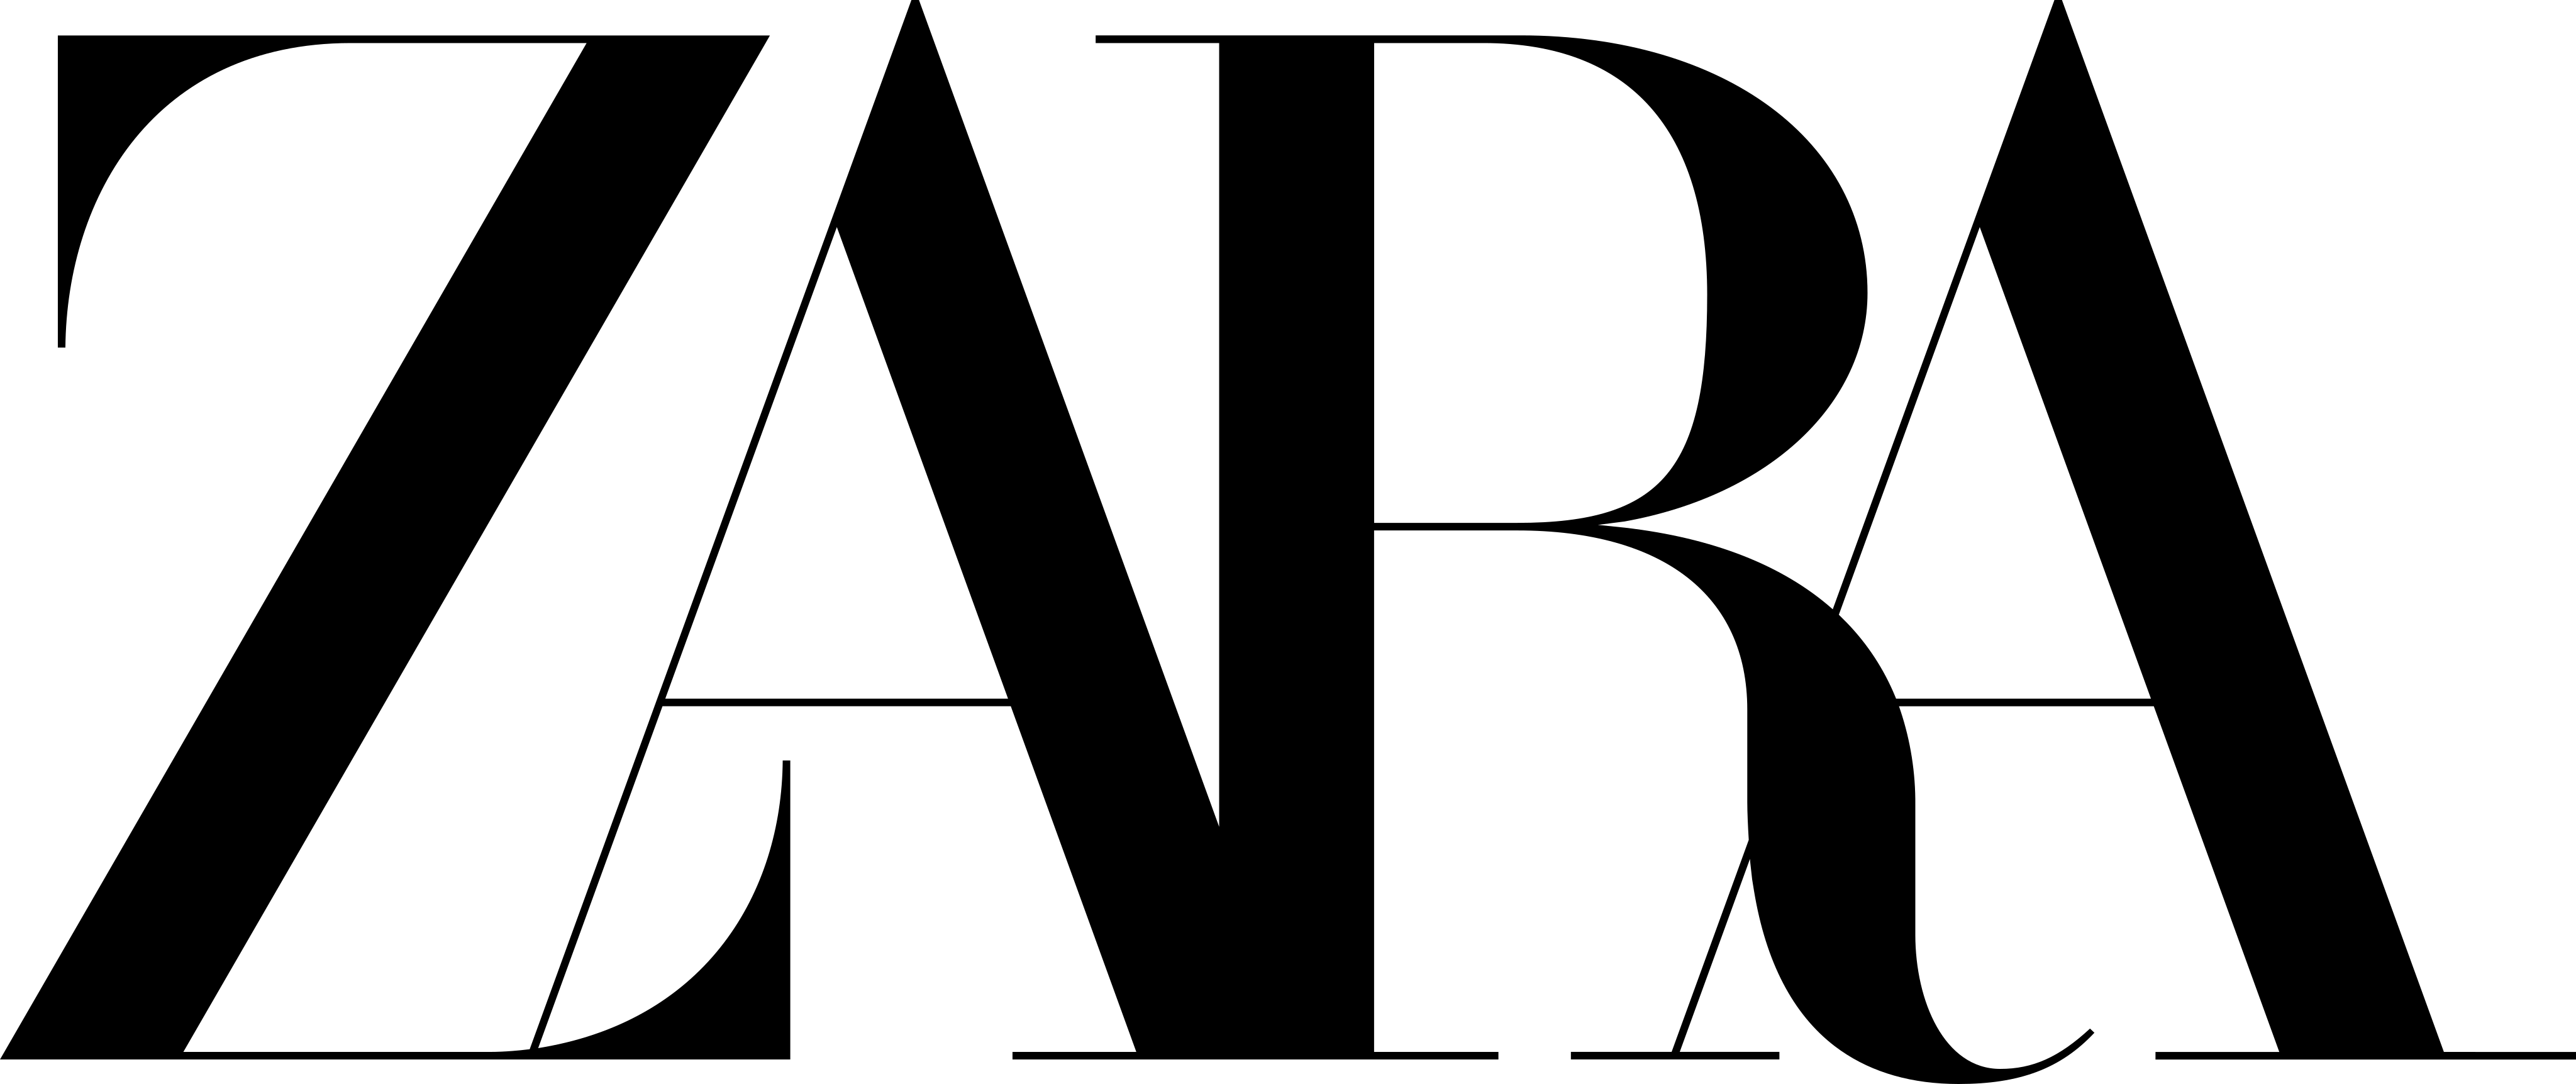 zara logo 1 - Zara Logo